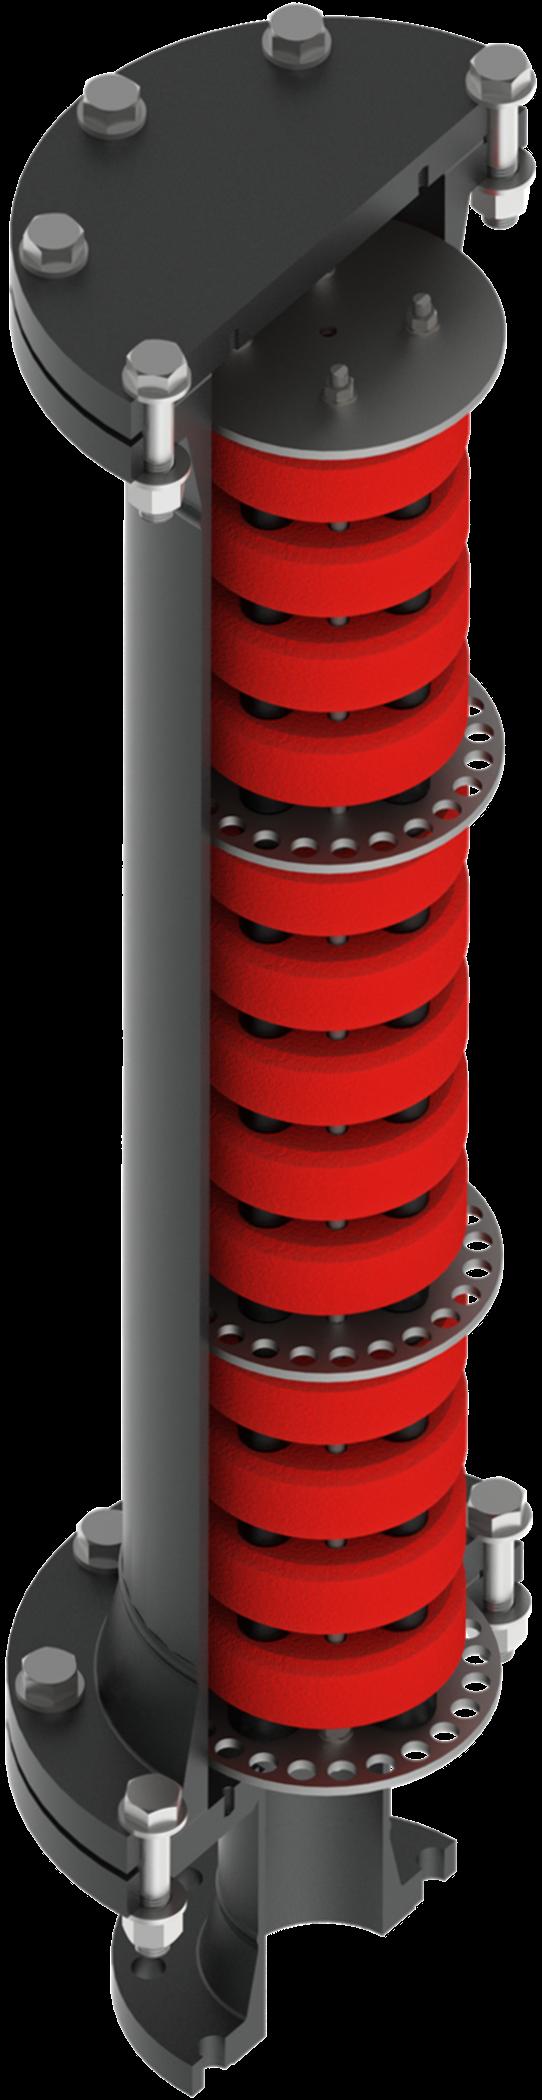 Sigma Drilling Technologies image 4